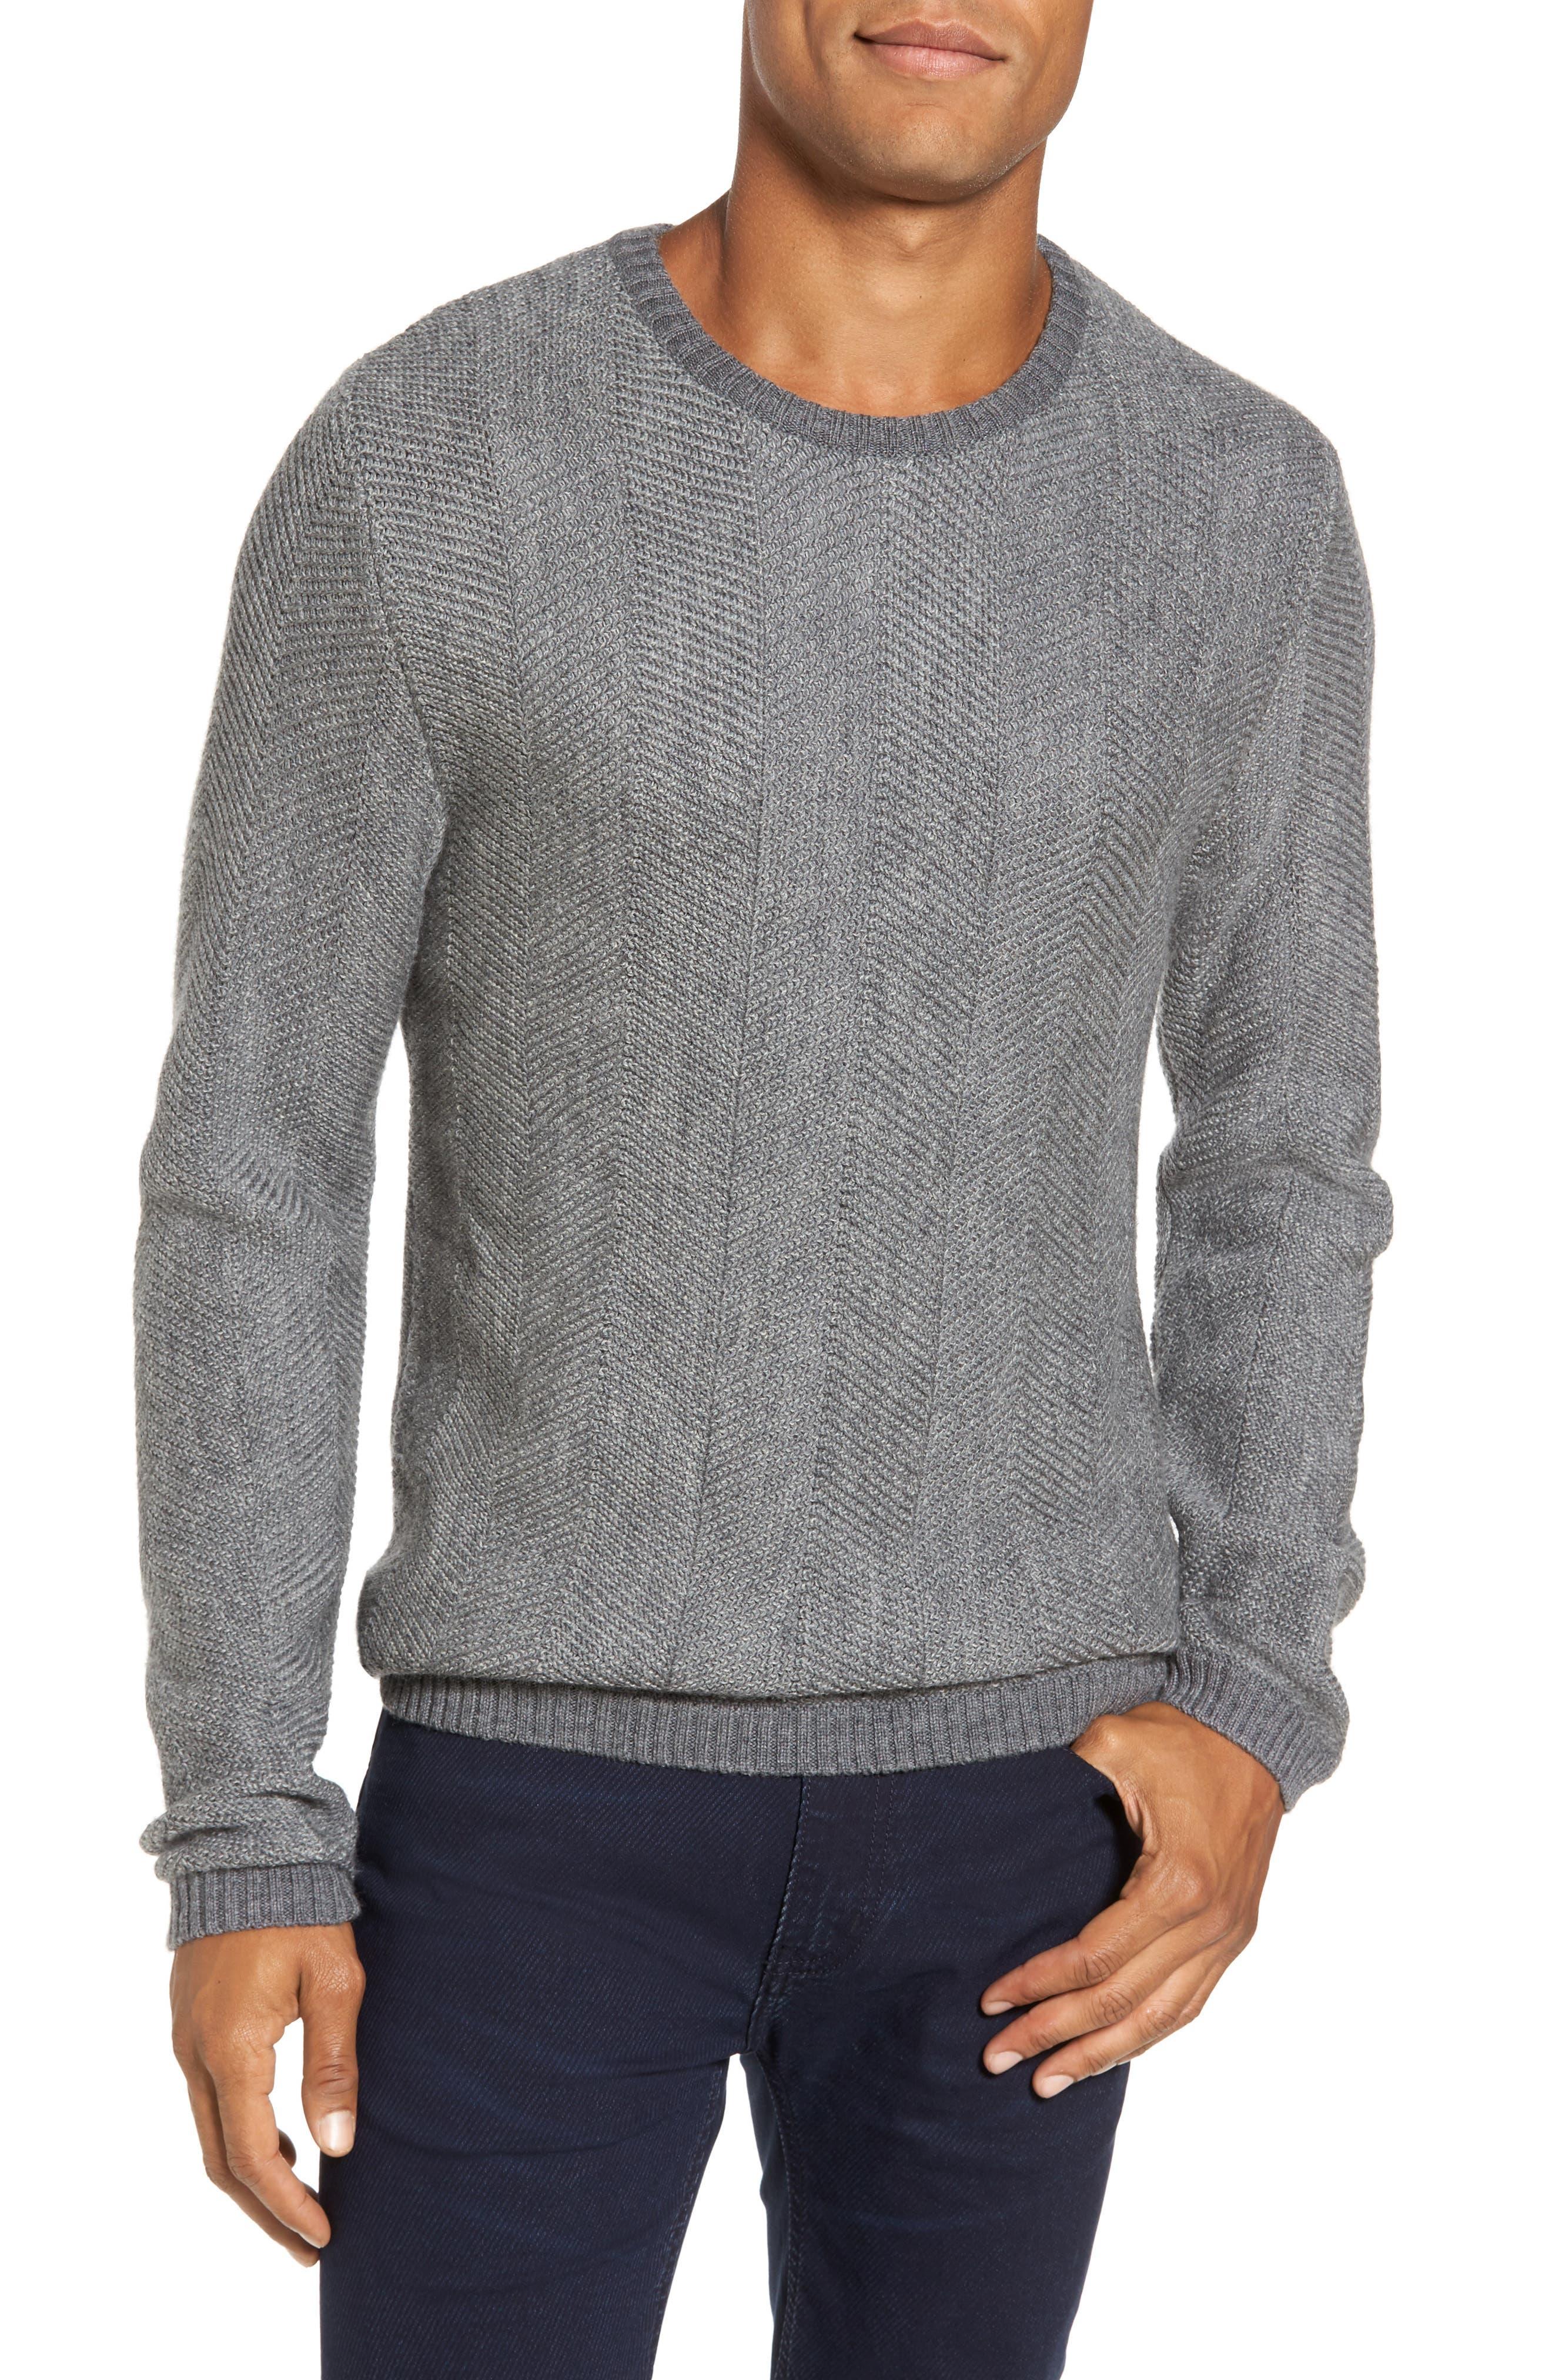 Image of RODD AND GUNN Mount Grand Wool Sweater